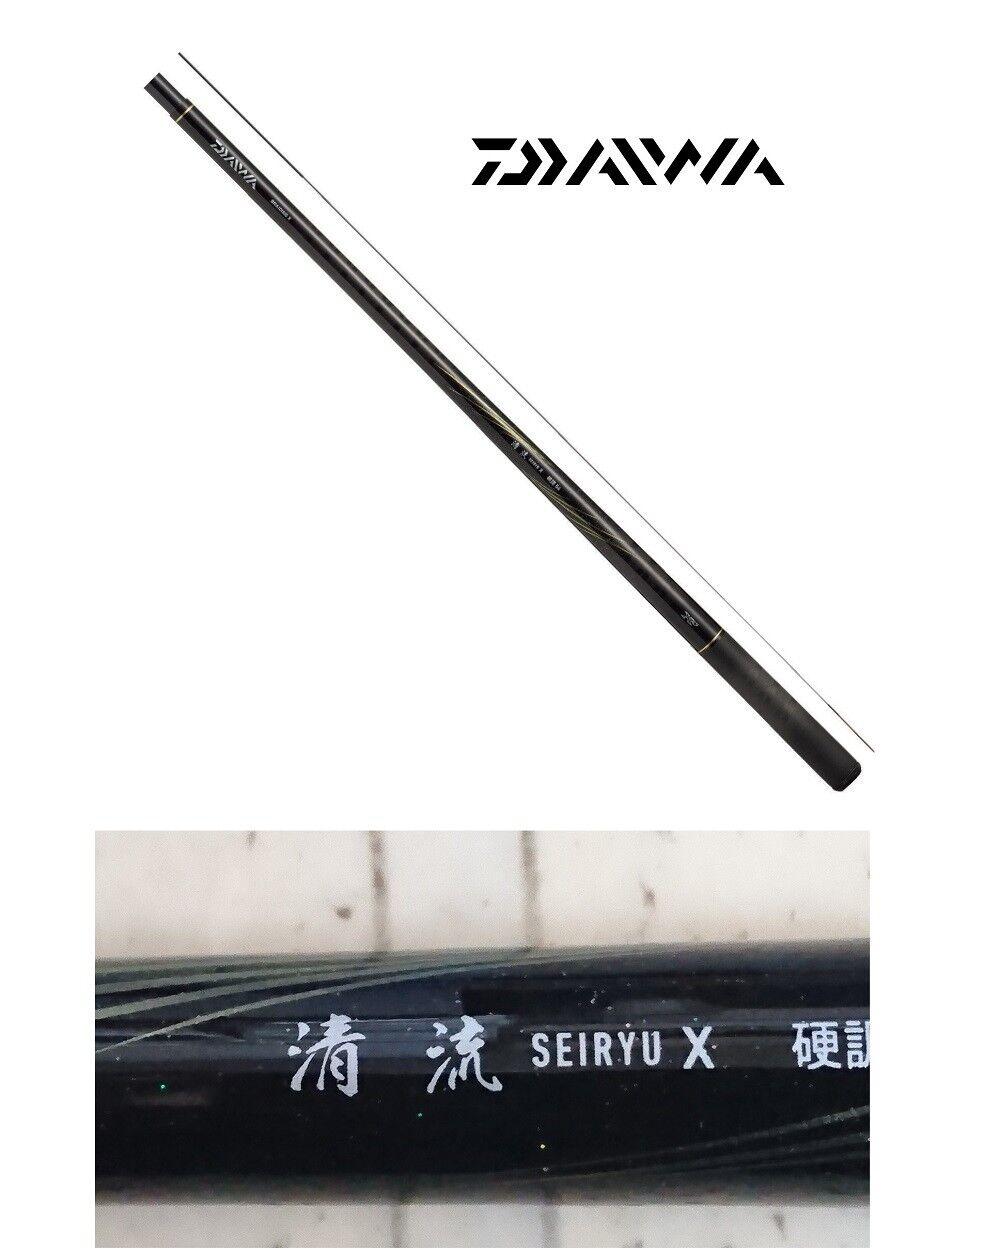 Daiwa SEIRYU X Koucho 54 Telescopic Rod Fishing Pole Canne TENKARA